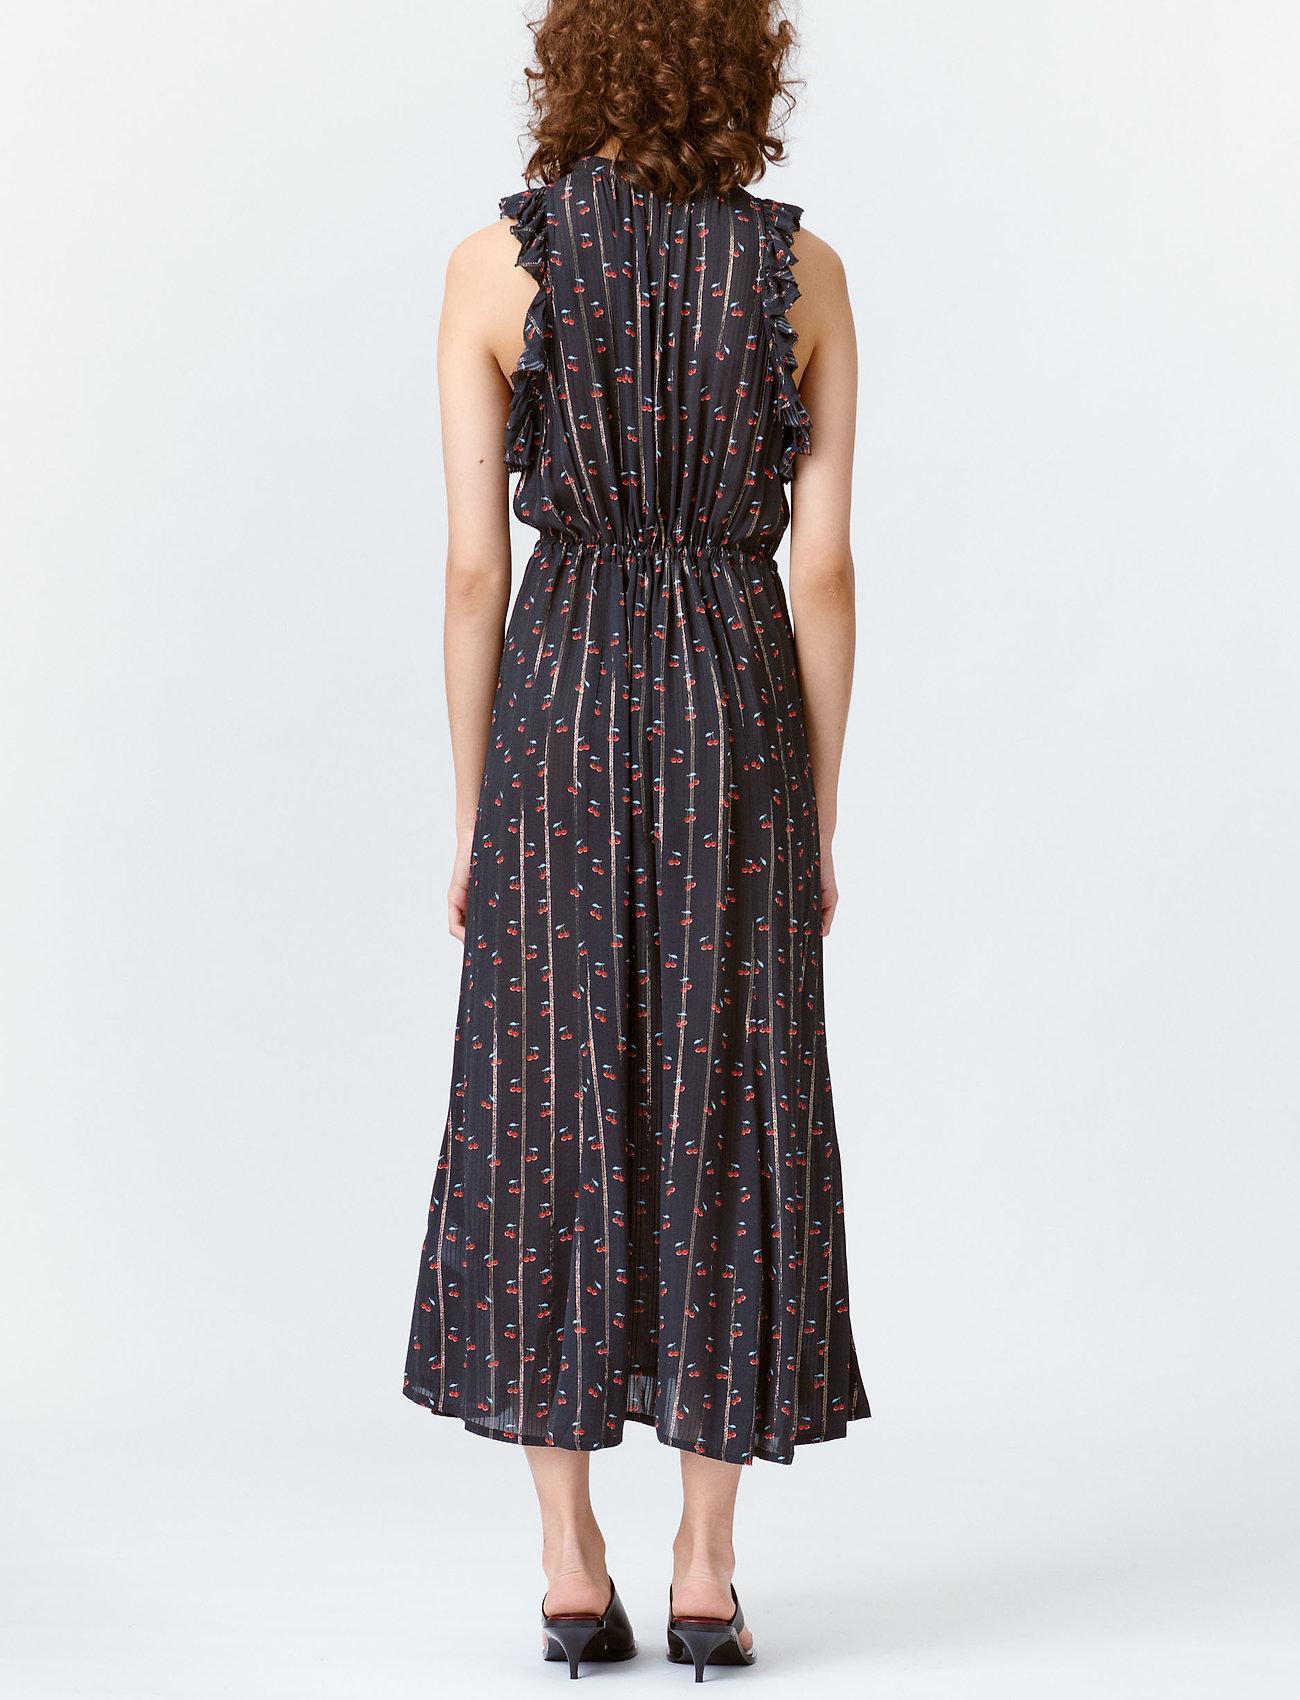 Munthe - PARSLEY - maxi dresses - black - 3